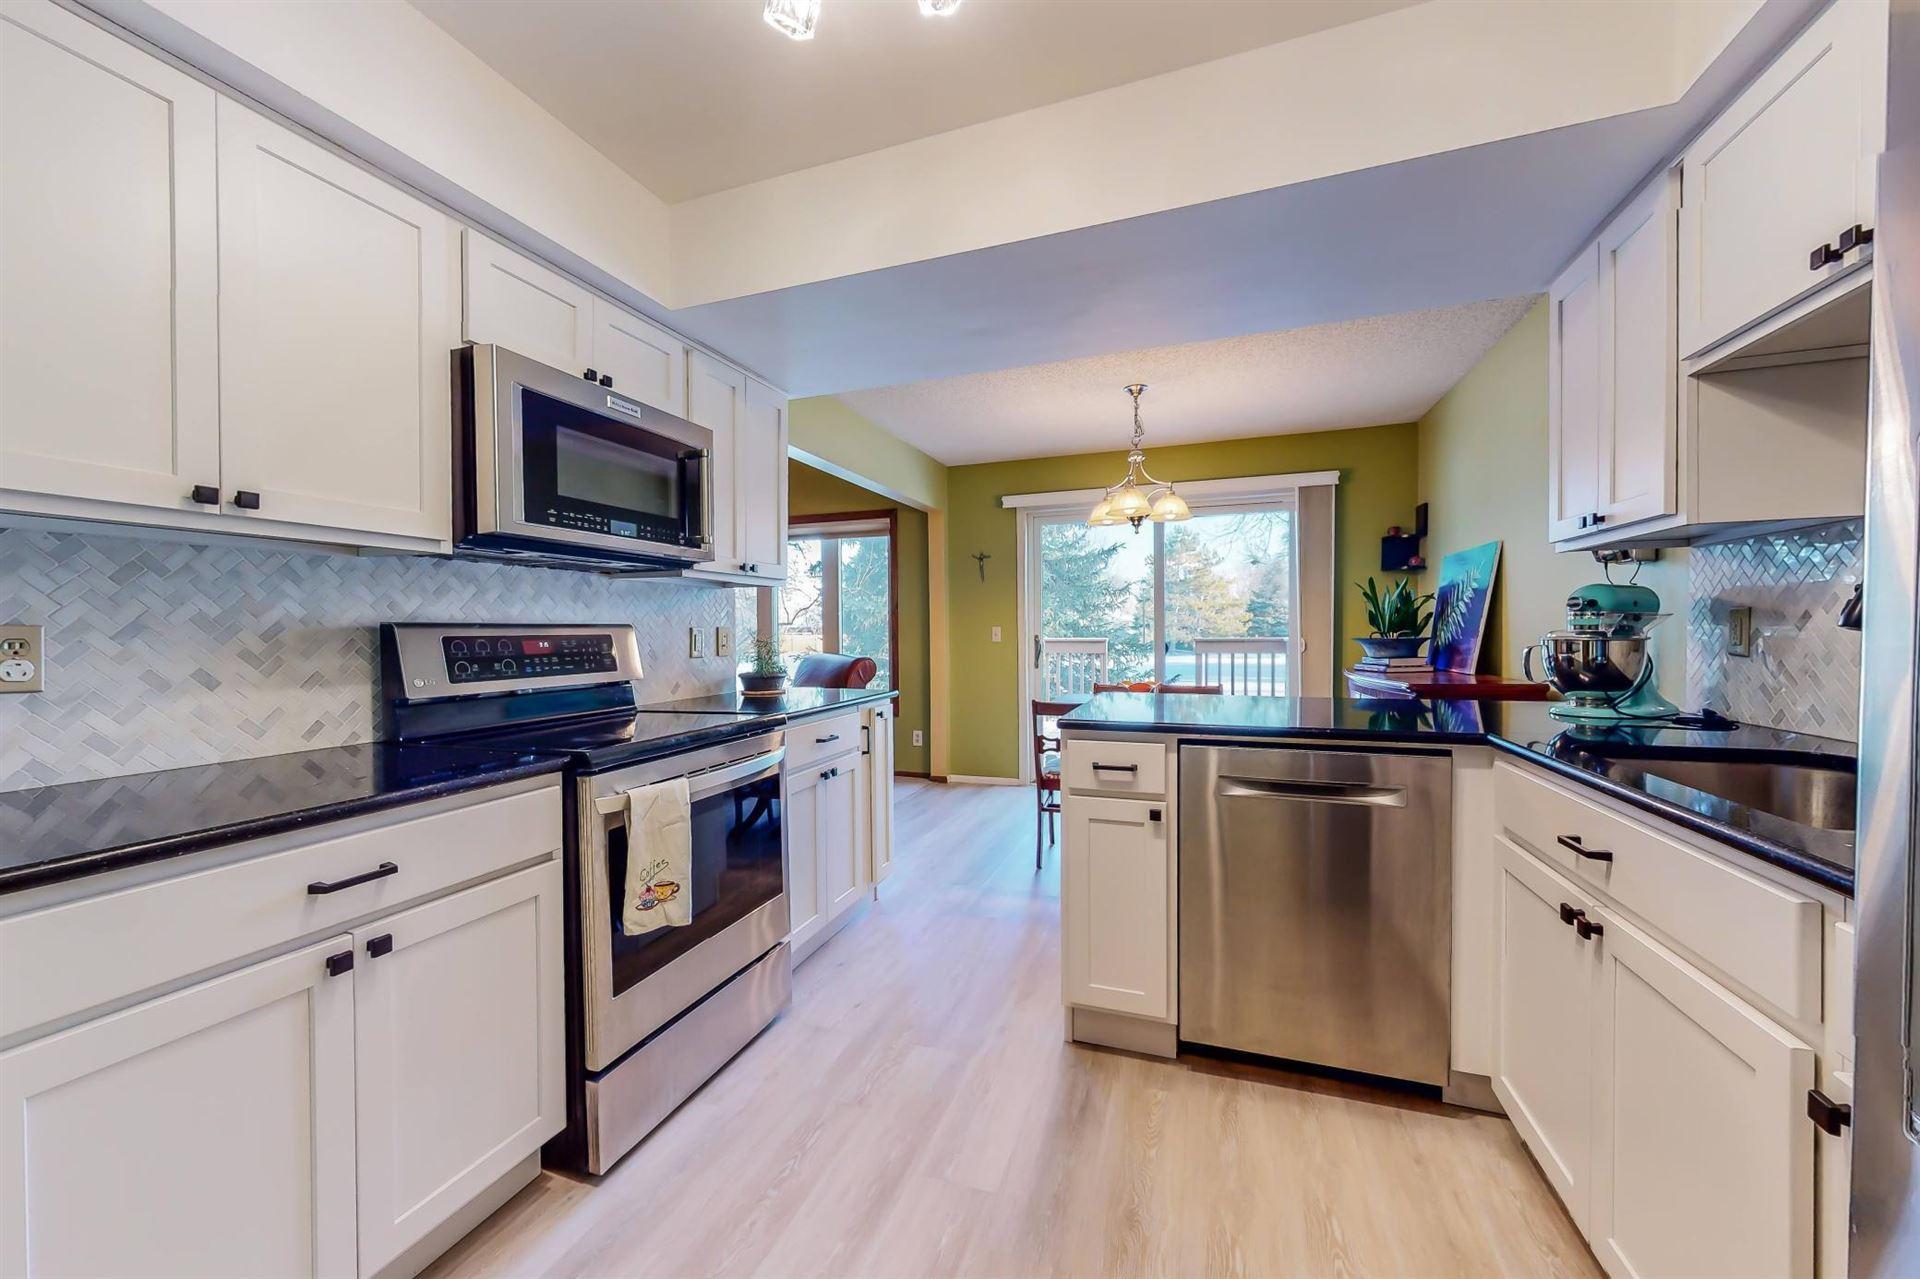 Photo of 5403 Upper 147th Street W, Apple Valley, MN 55124 (MLS # 5699745)